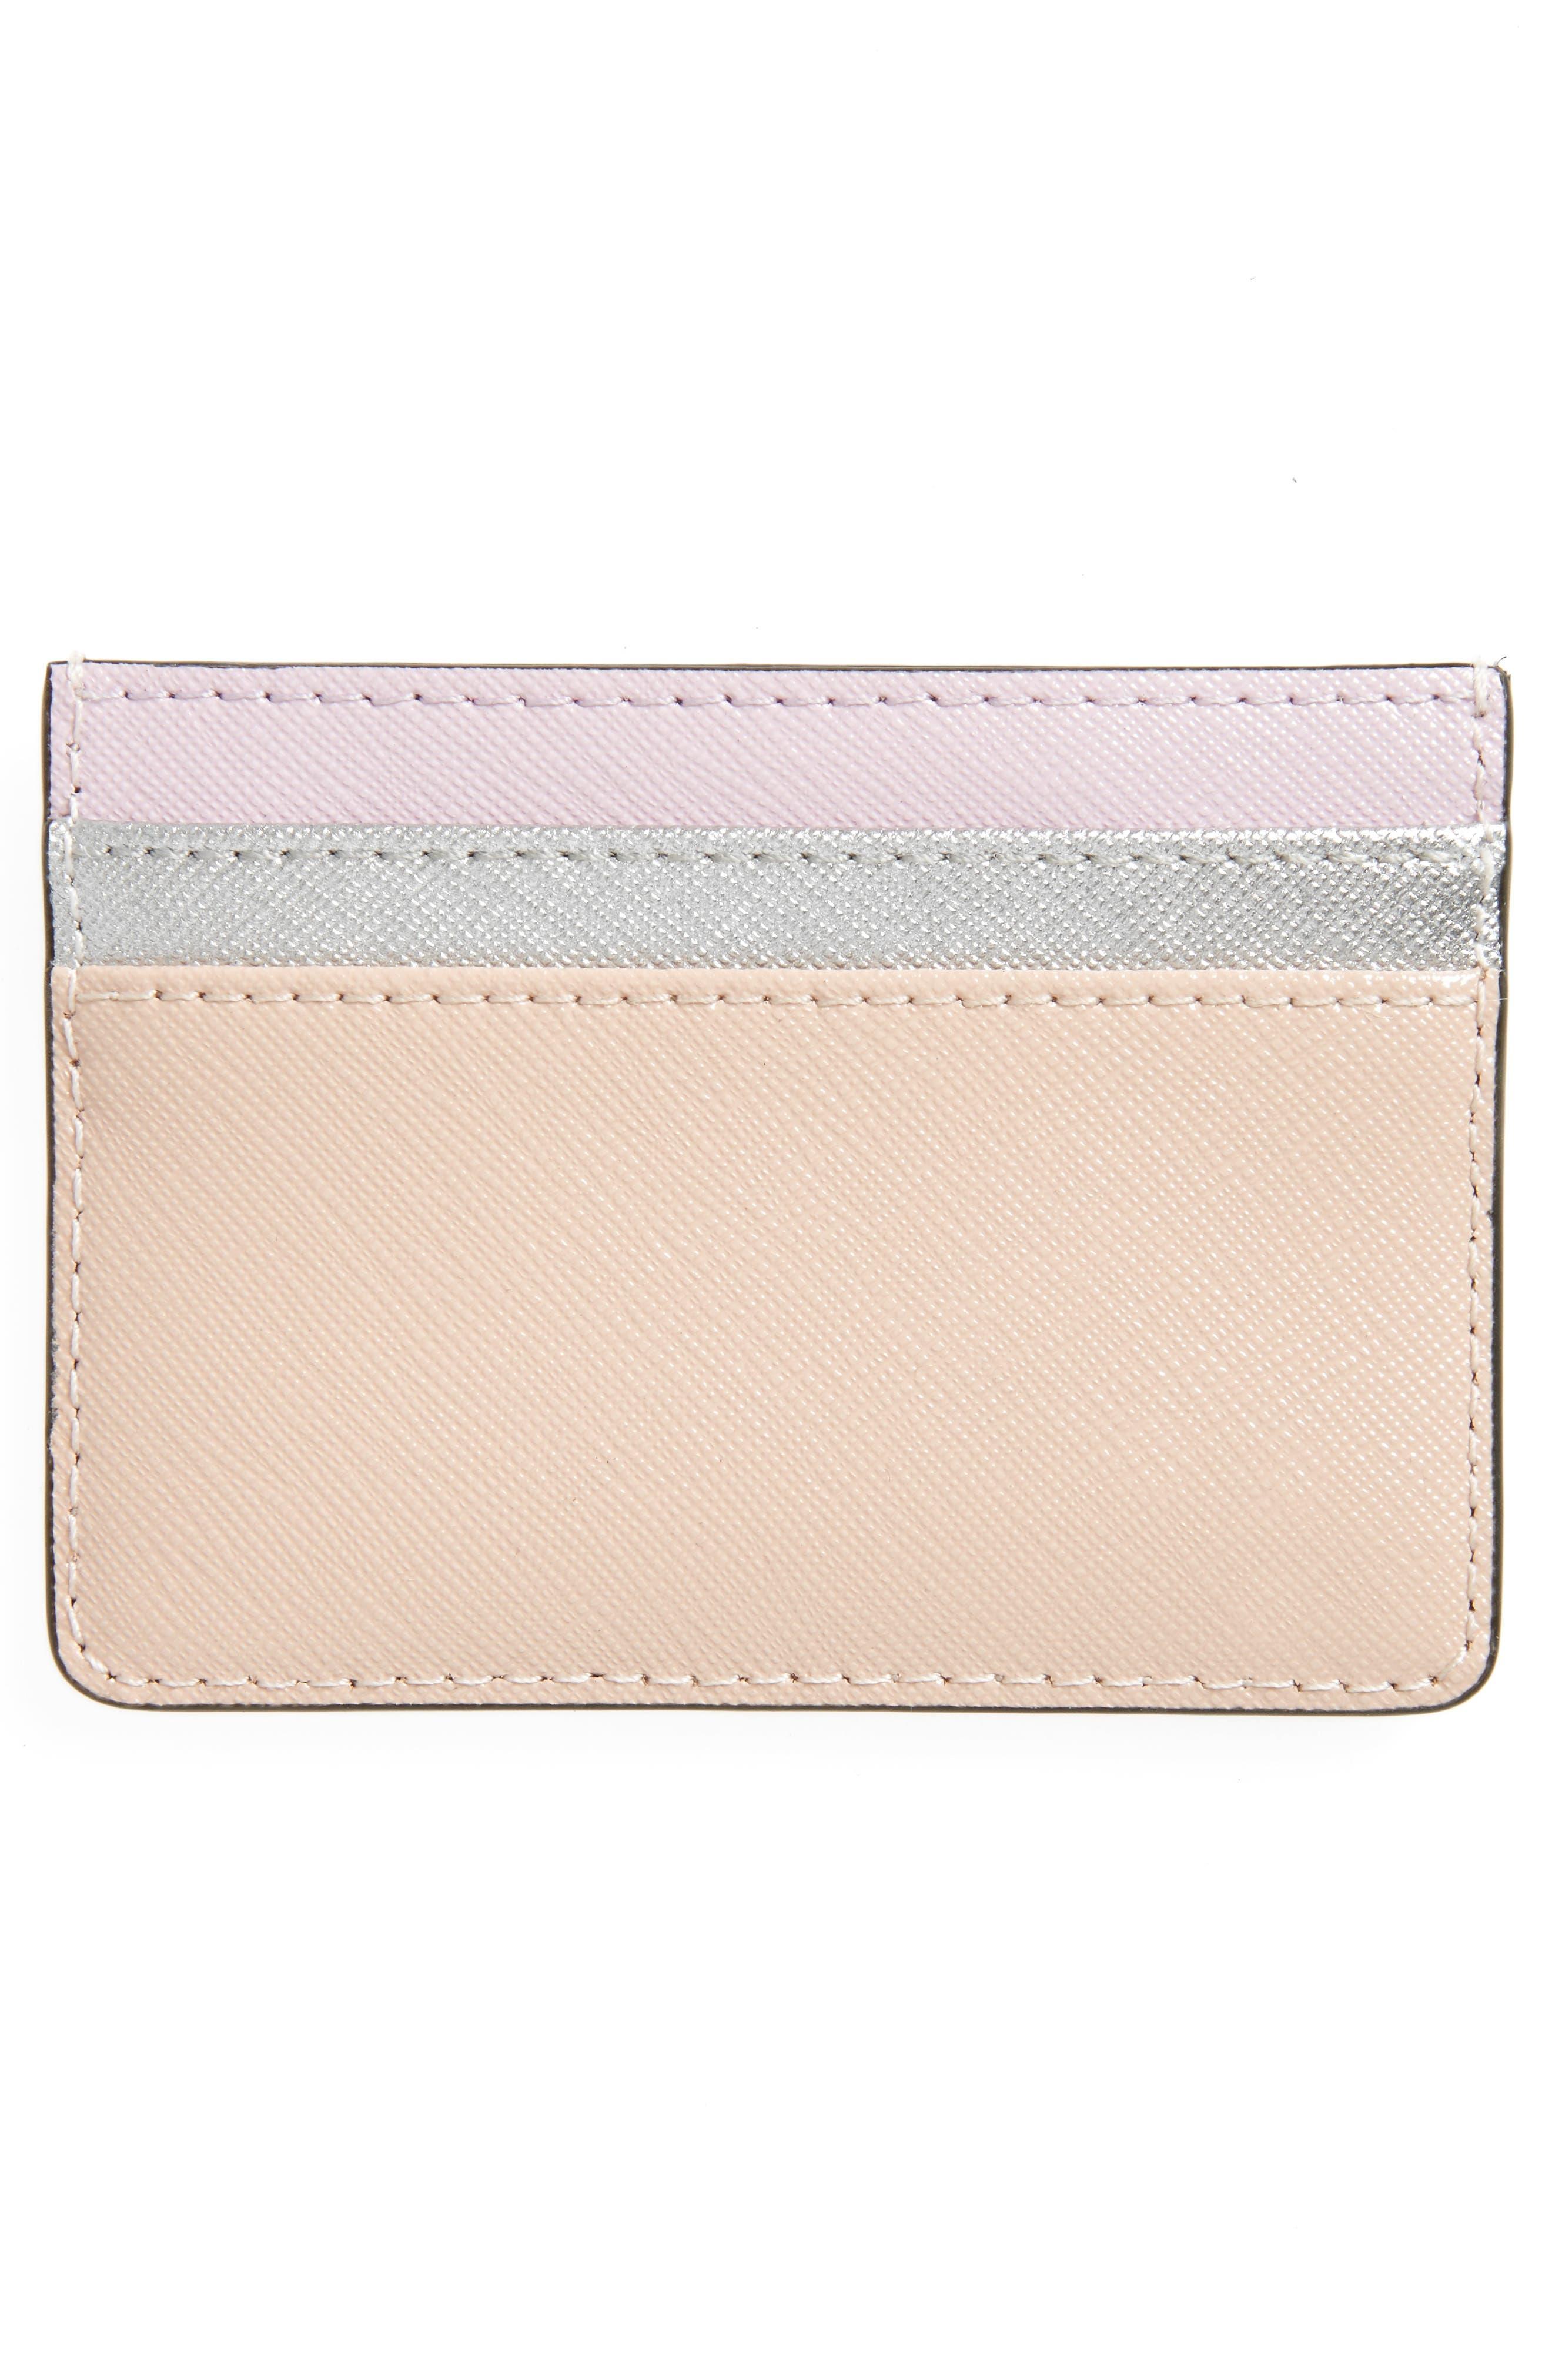 Color Block Saffiano Leather Card Case,                             Alternate thumbnail 10, color,